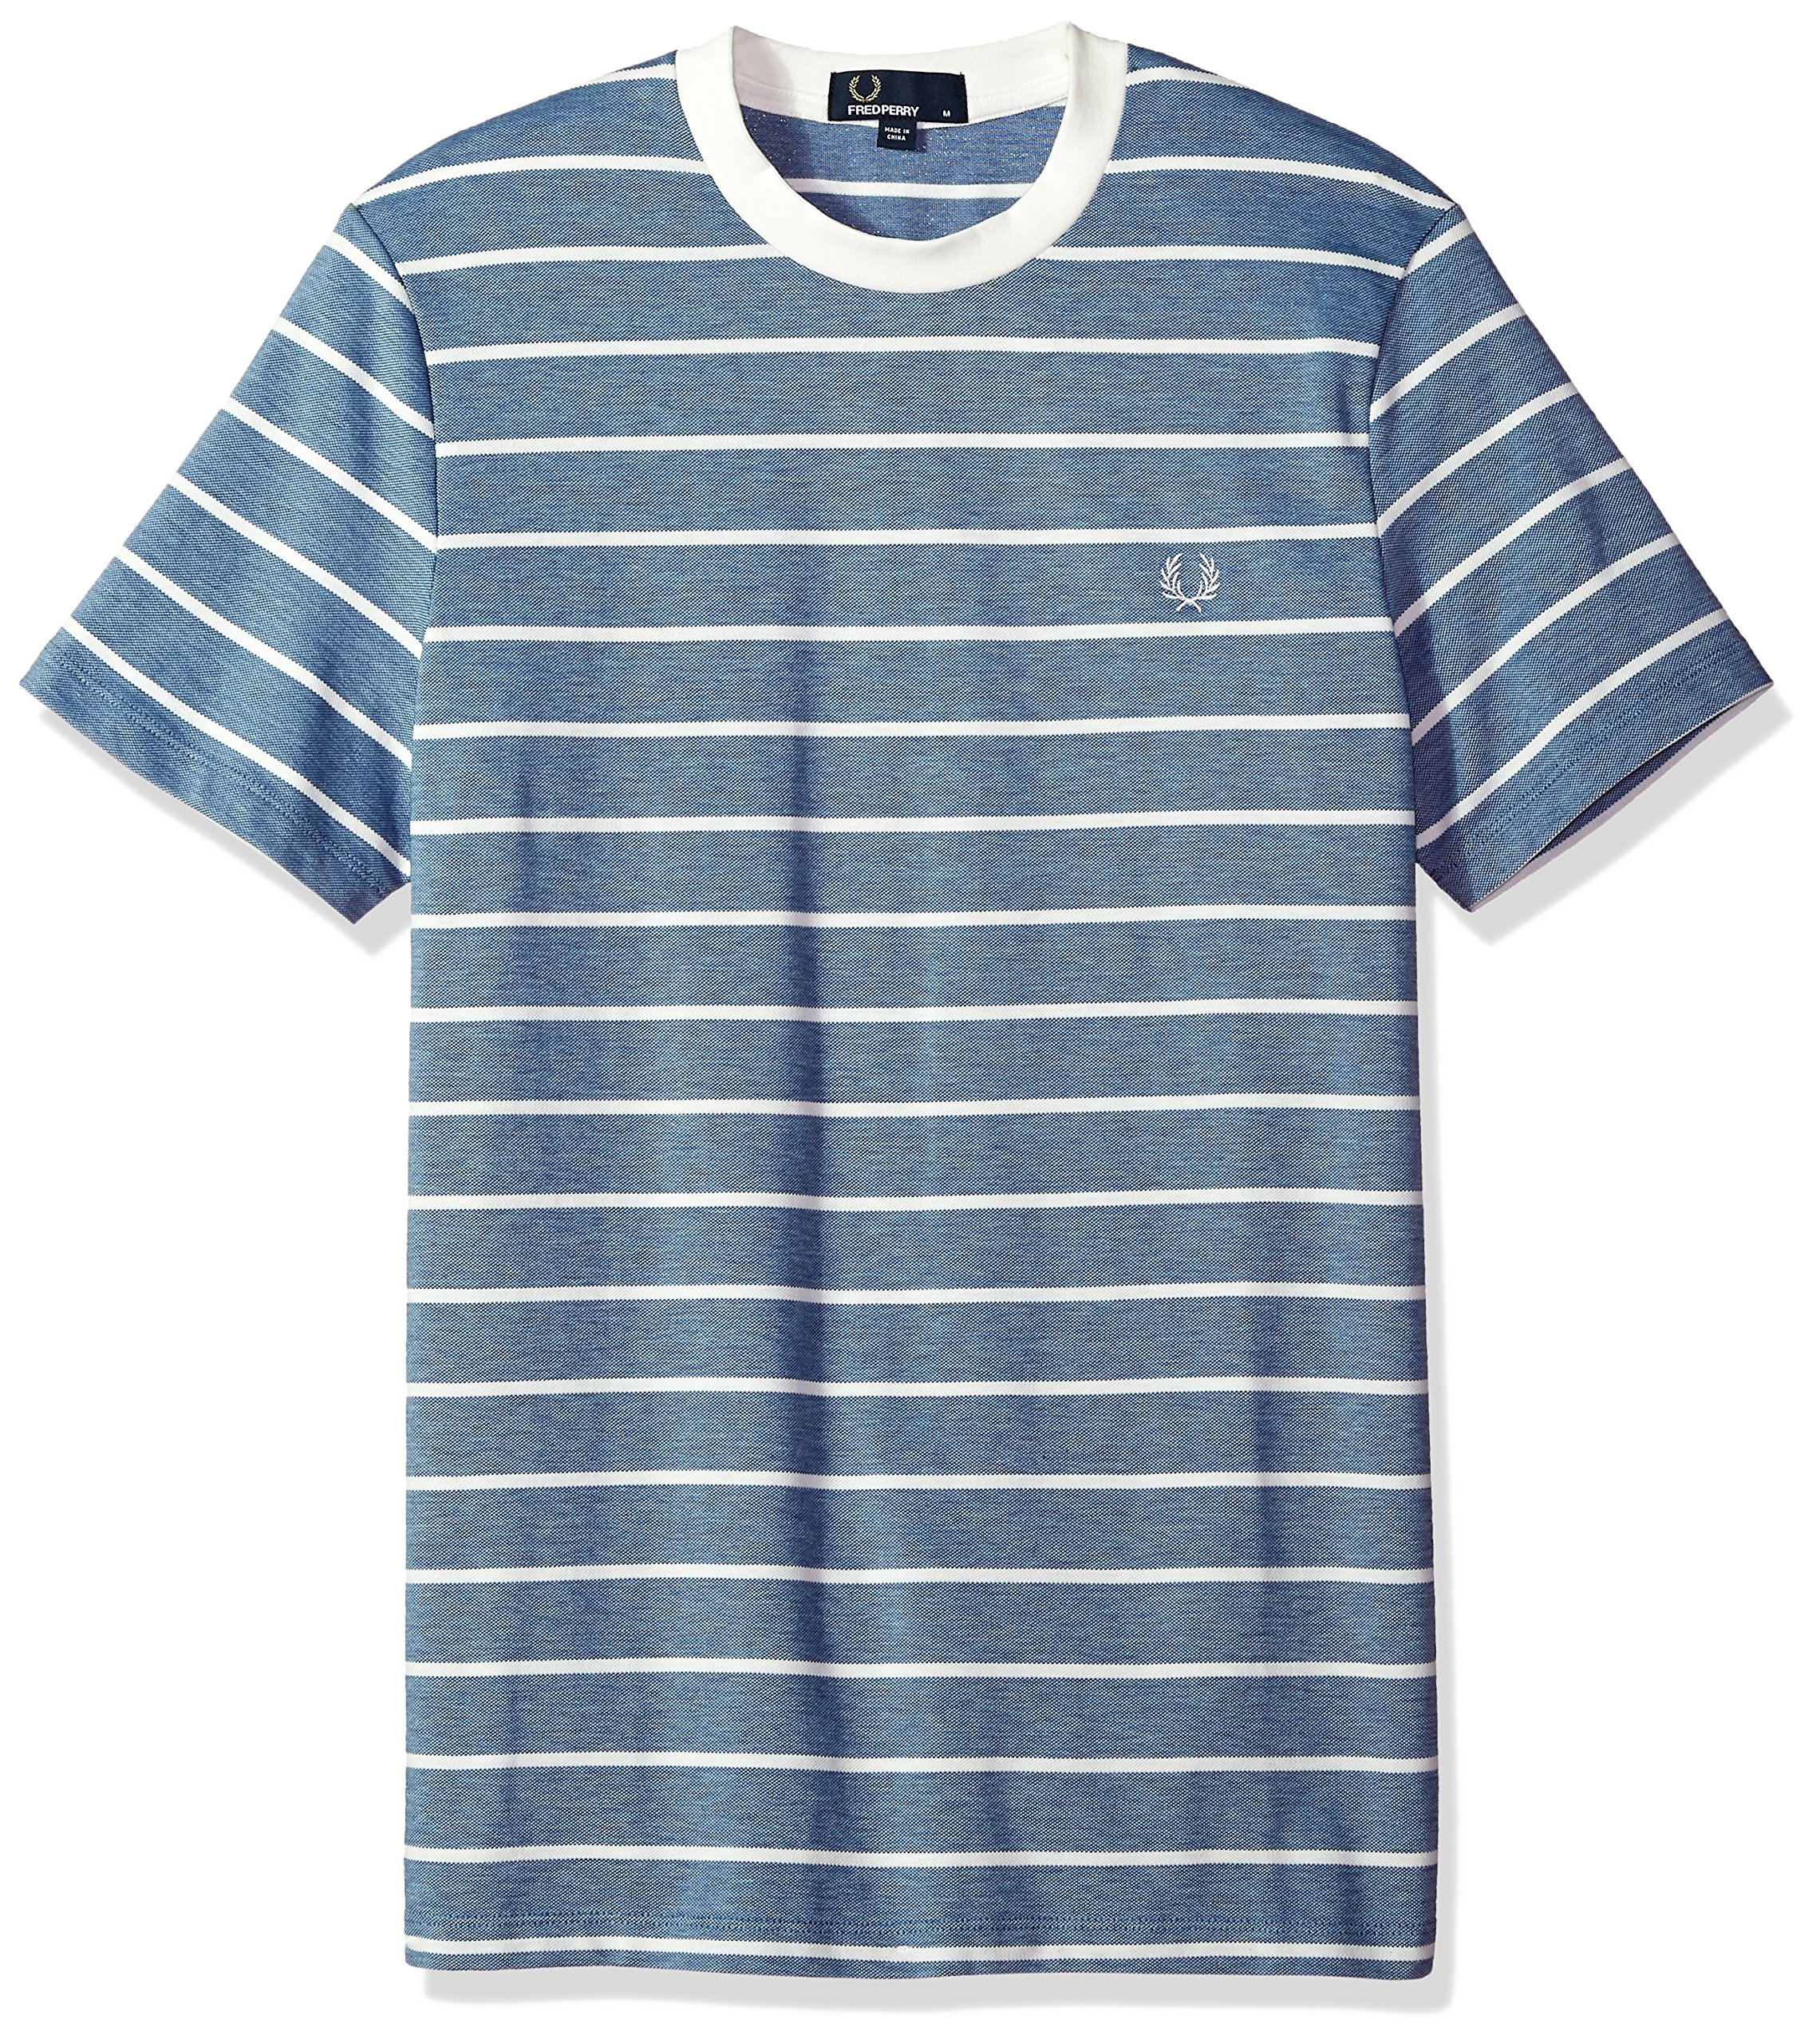 Fred Perry Men's Oxford Stripe Pique T-Shirt, Summer Blue, Medium